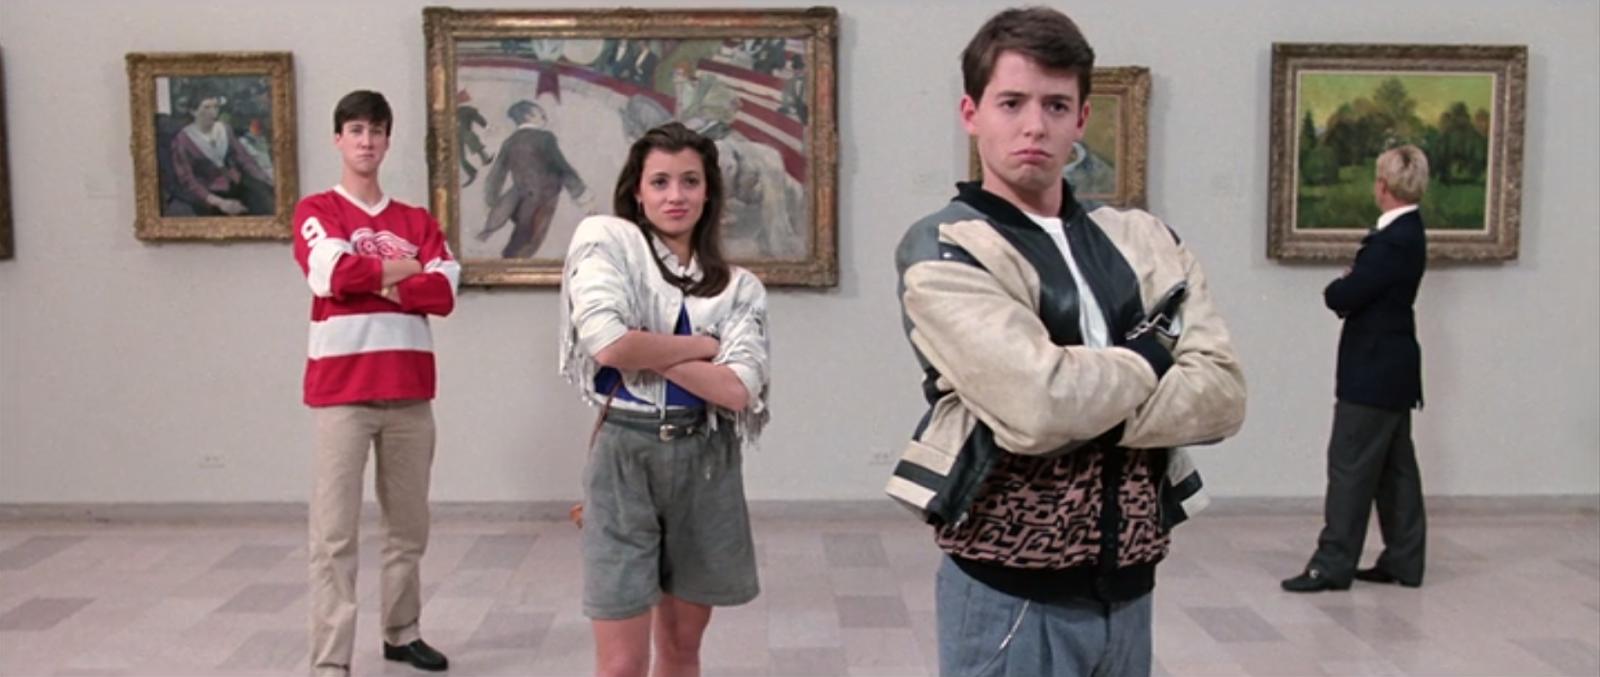 9-Museu-de-Arte-Chicago-Ferris-Bueller.png